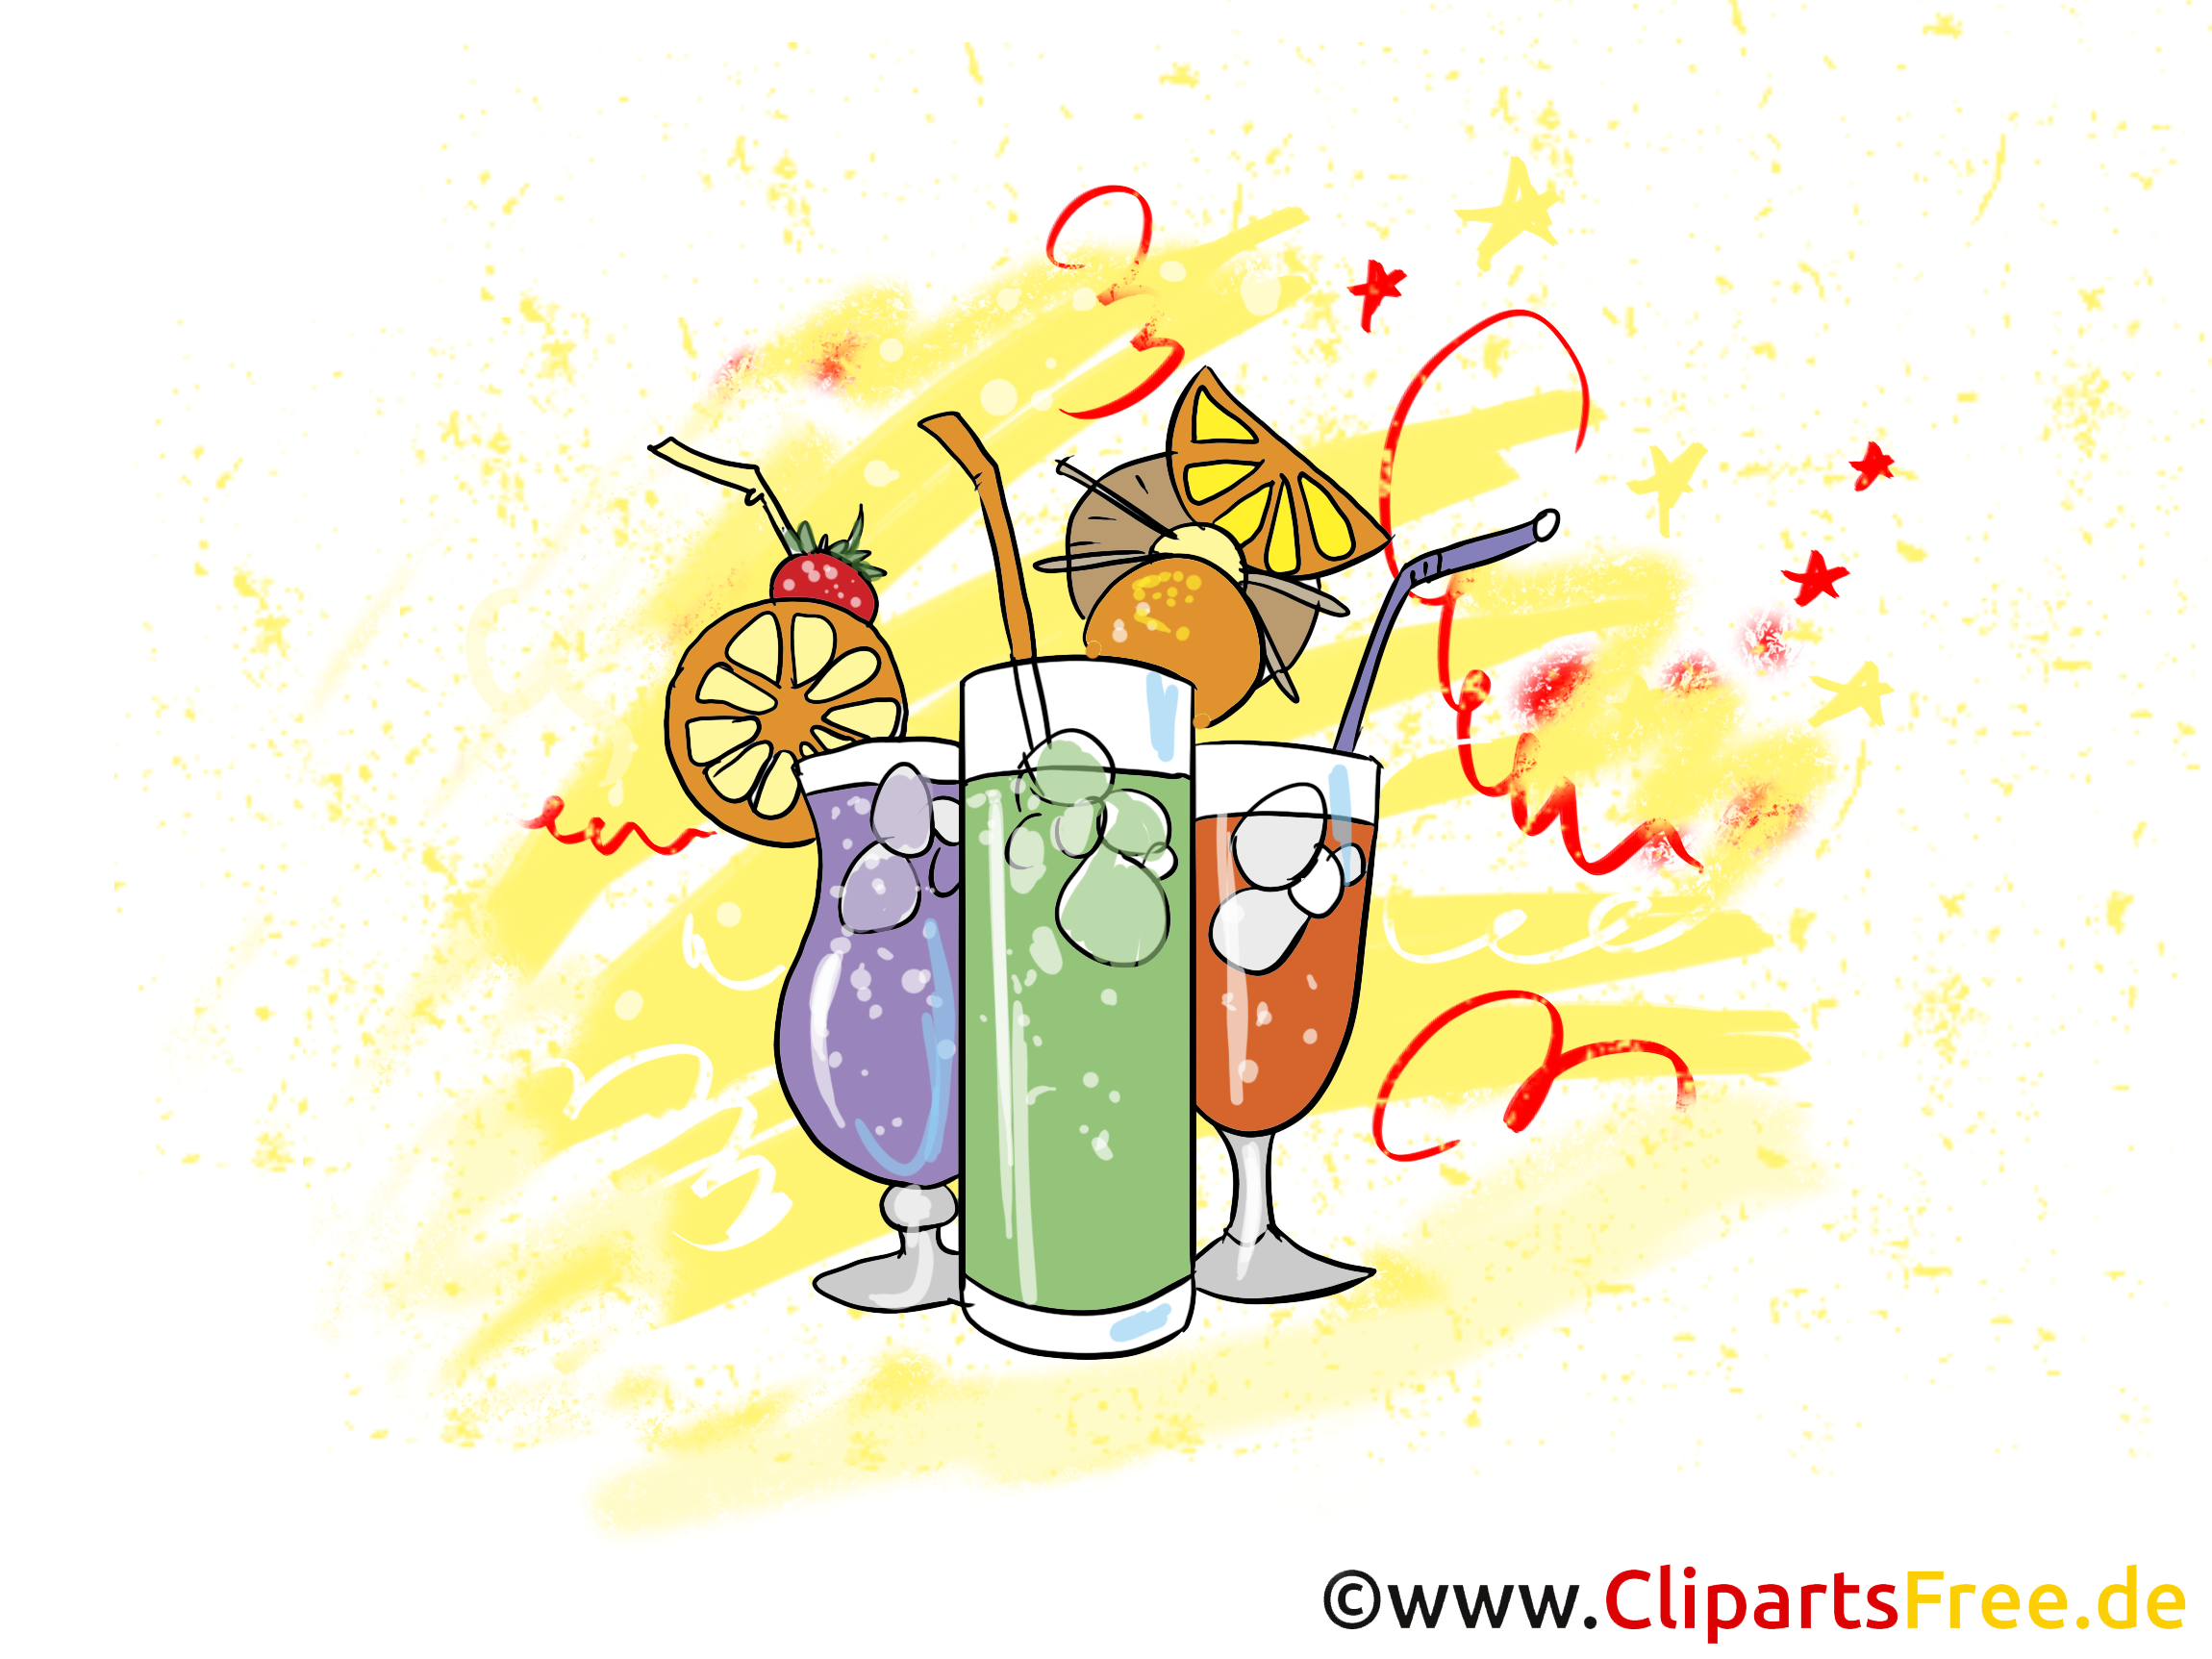 Cocktails dessin gratuit soir e clip arts faire la f te dessin picture image graphic - Dessin cocktail ...